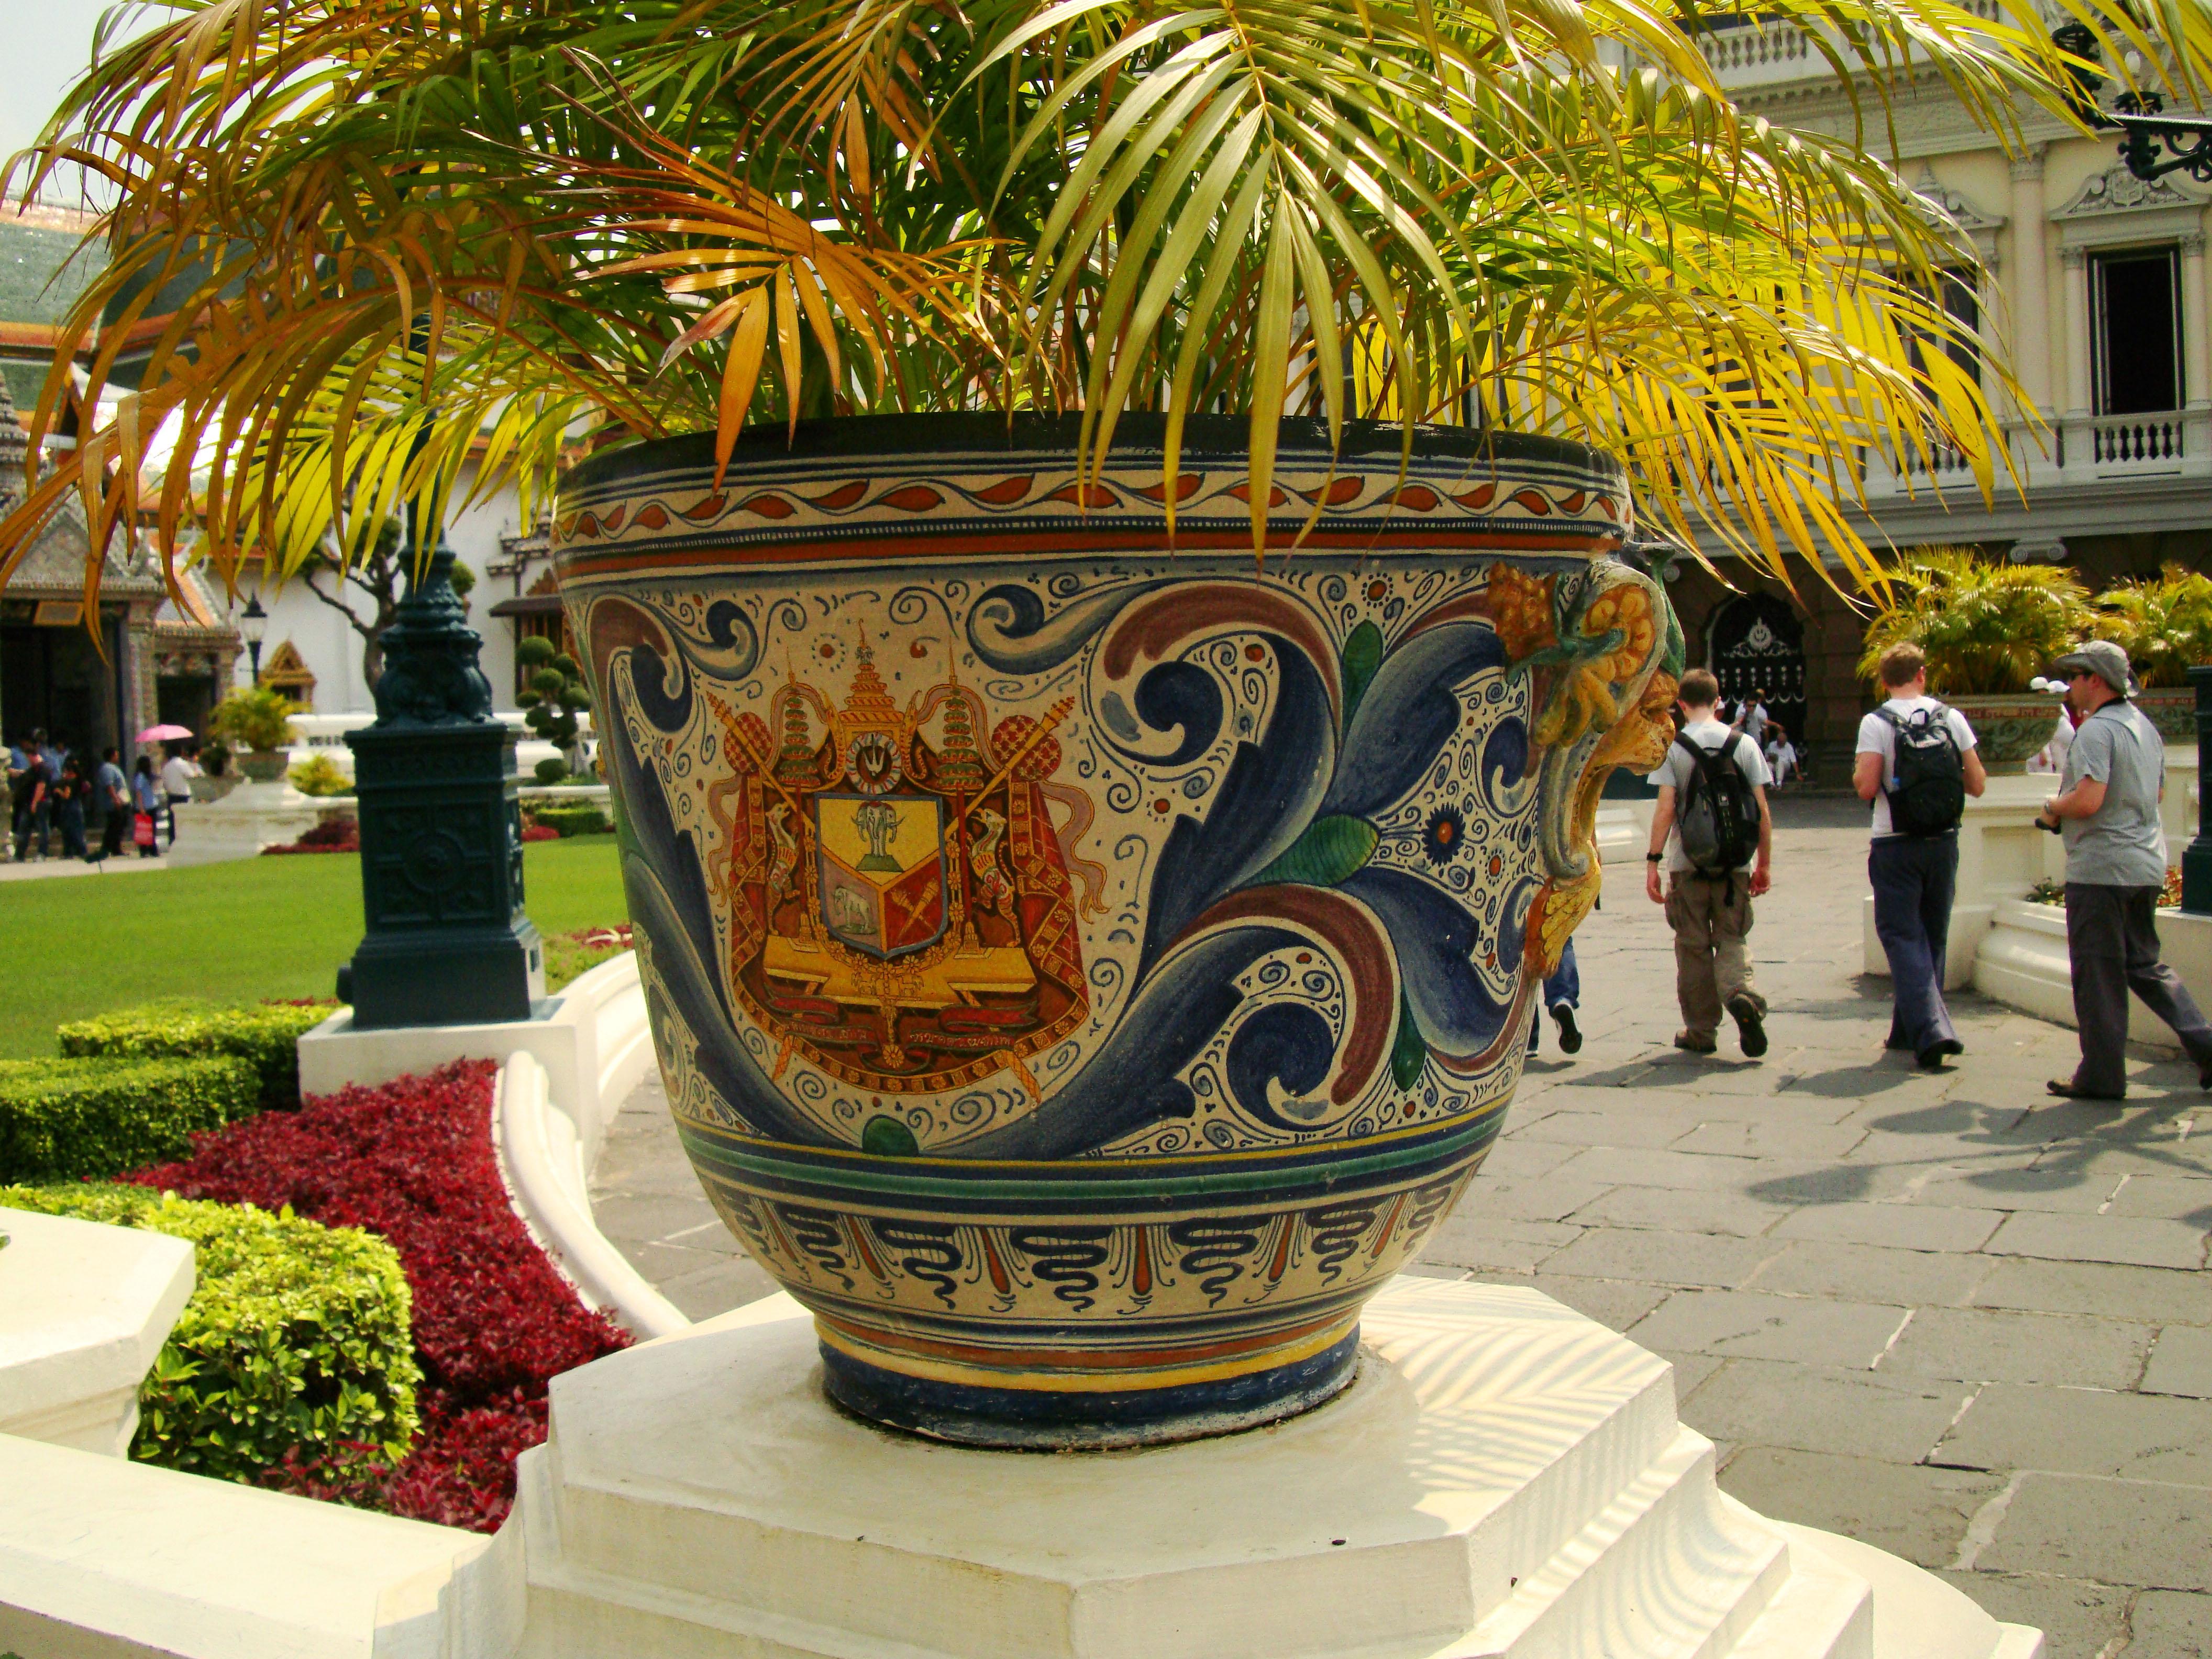 Grand Palace beautifully designed Chinese Mosaic flower pots Bangkok 01